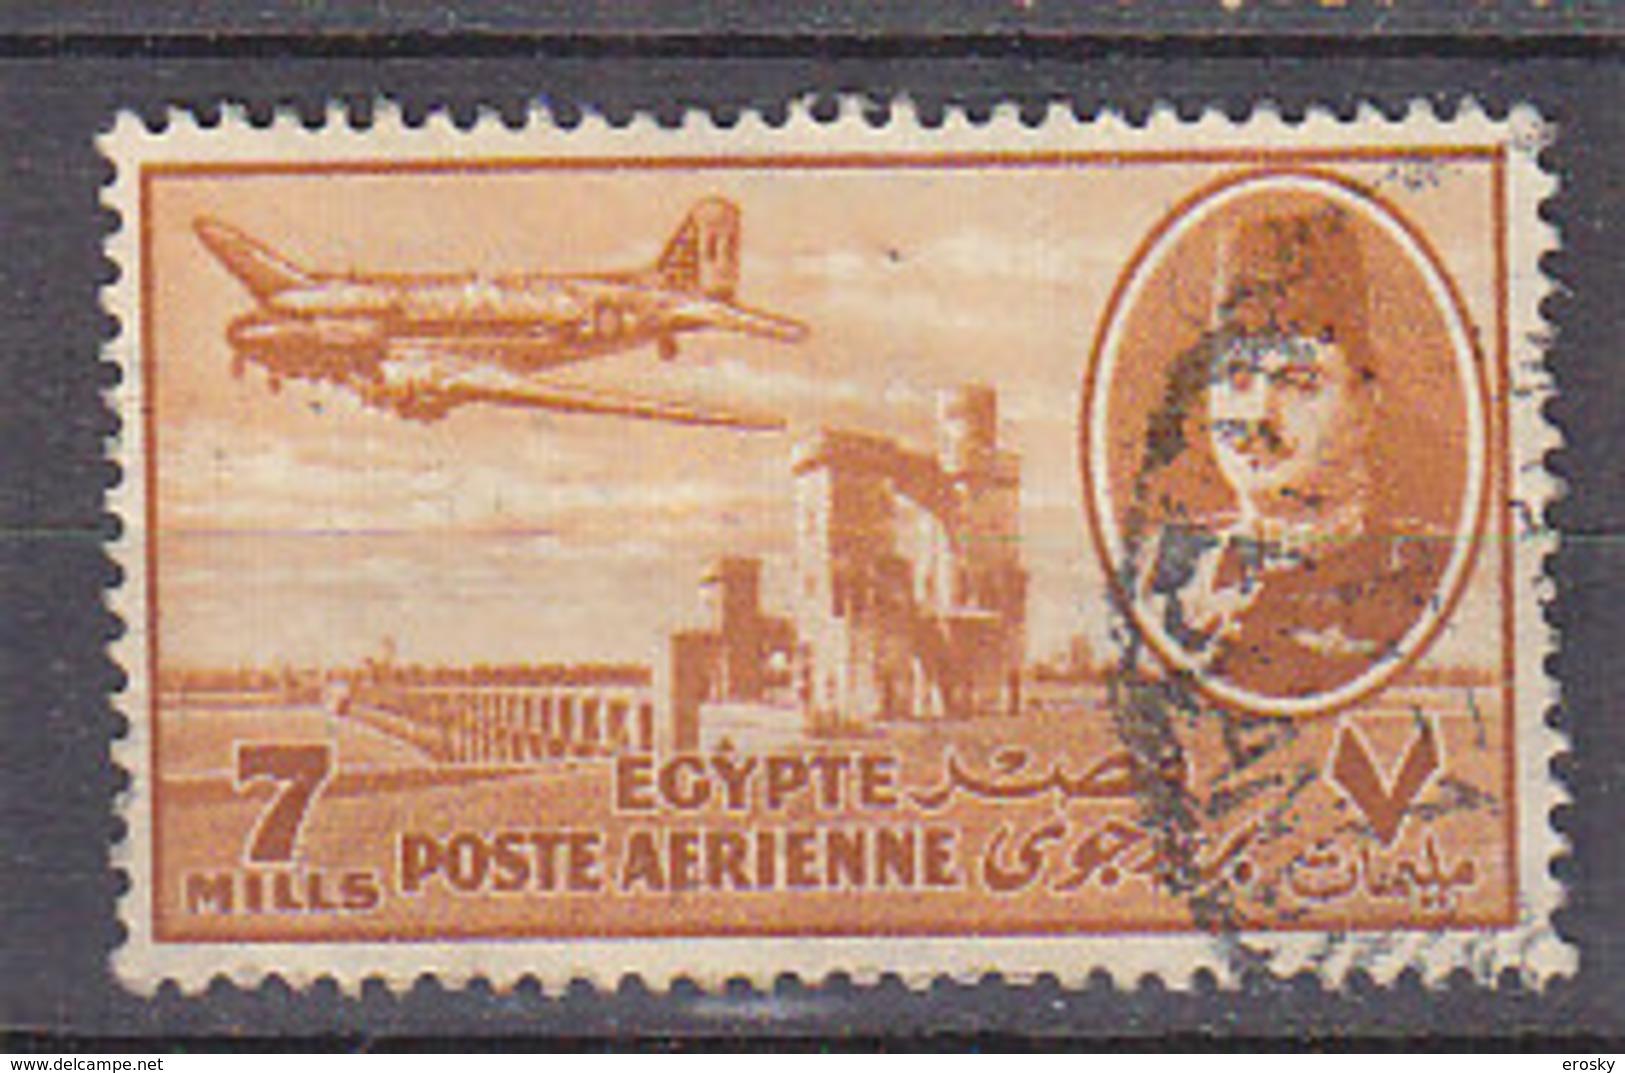 A0779 - EGYPTE EGYPT AERIENNE Yv N°32 - Poste Aérienne